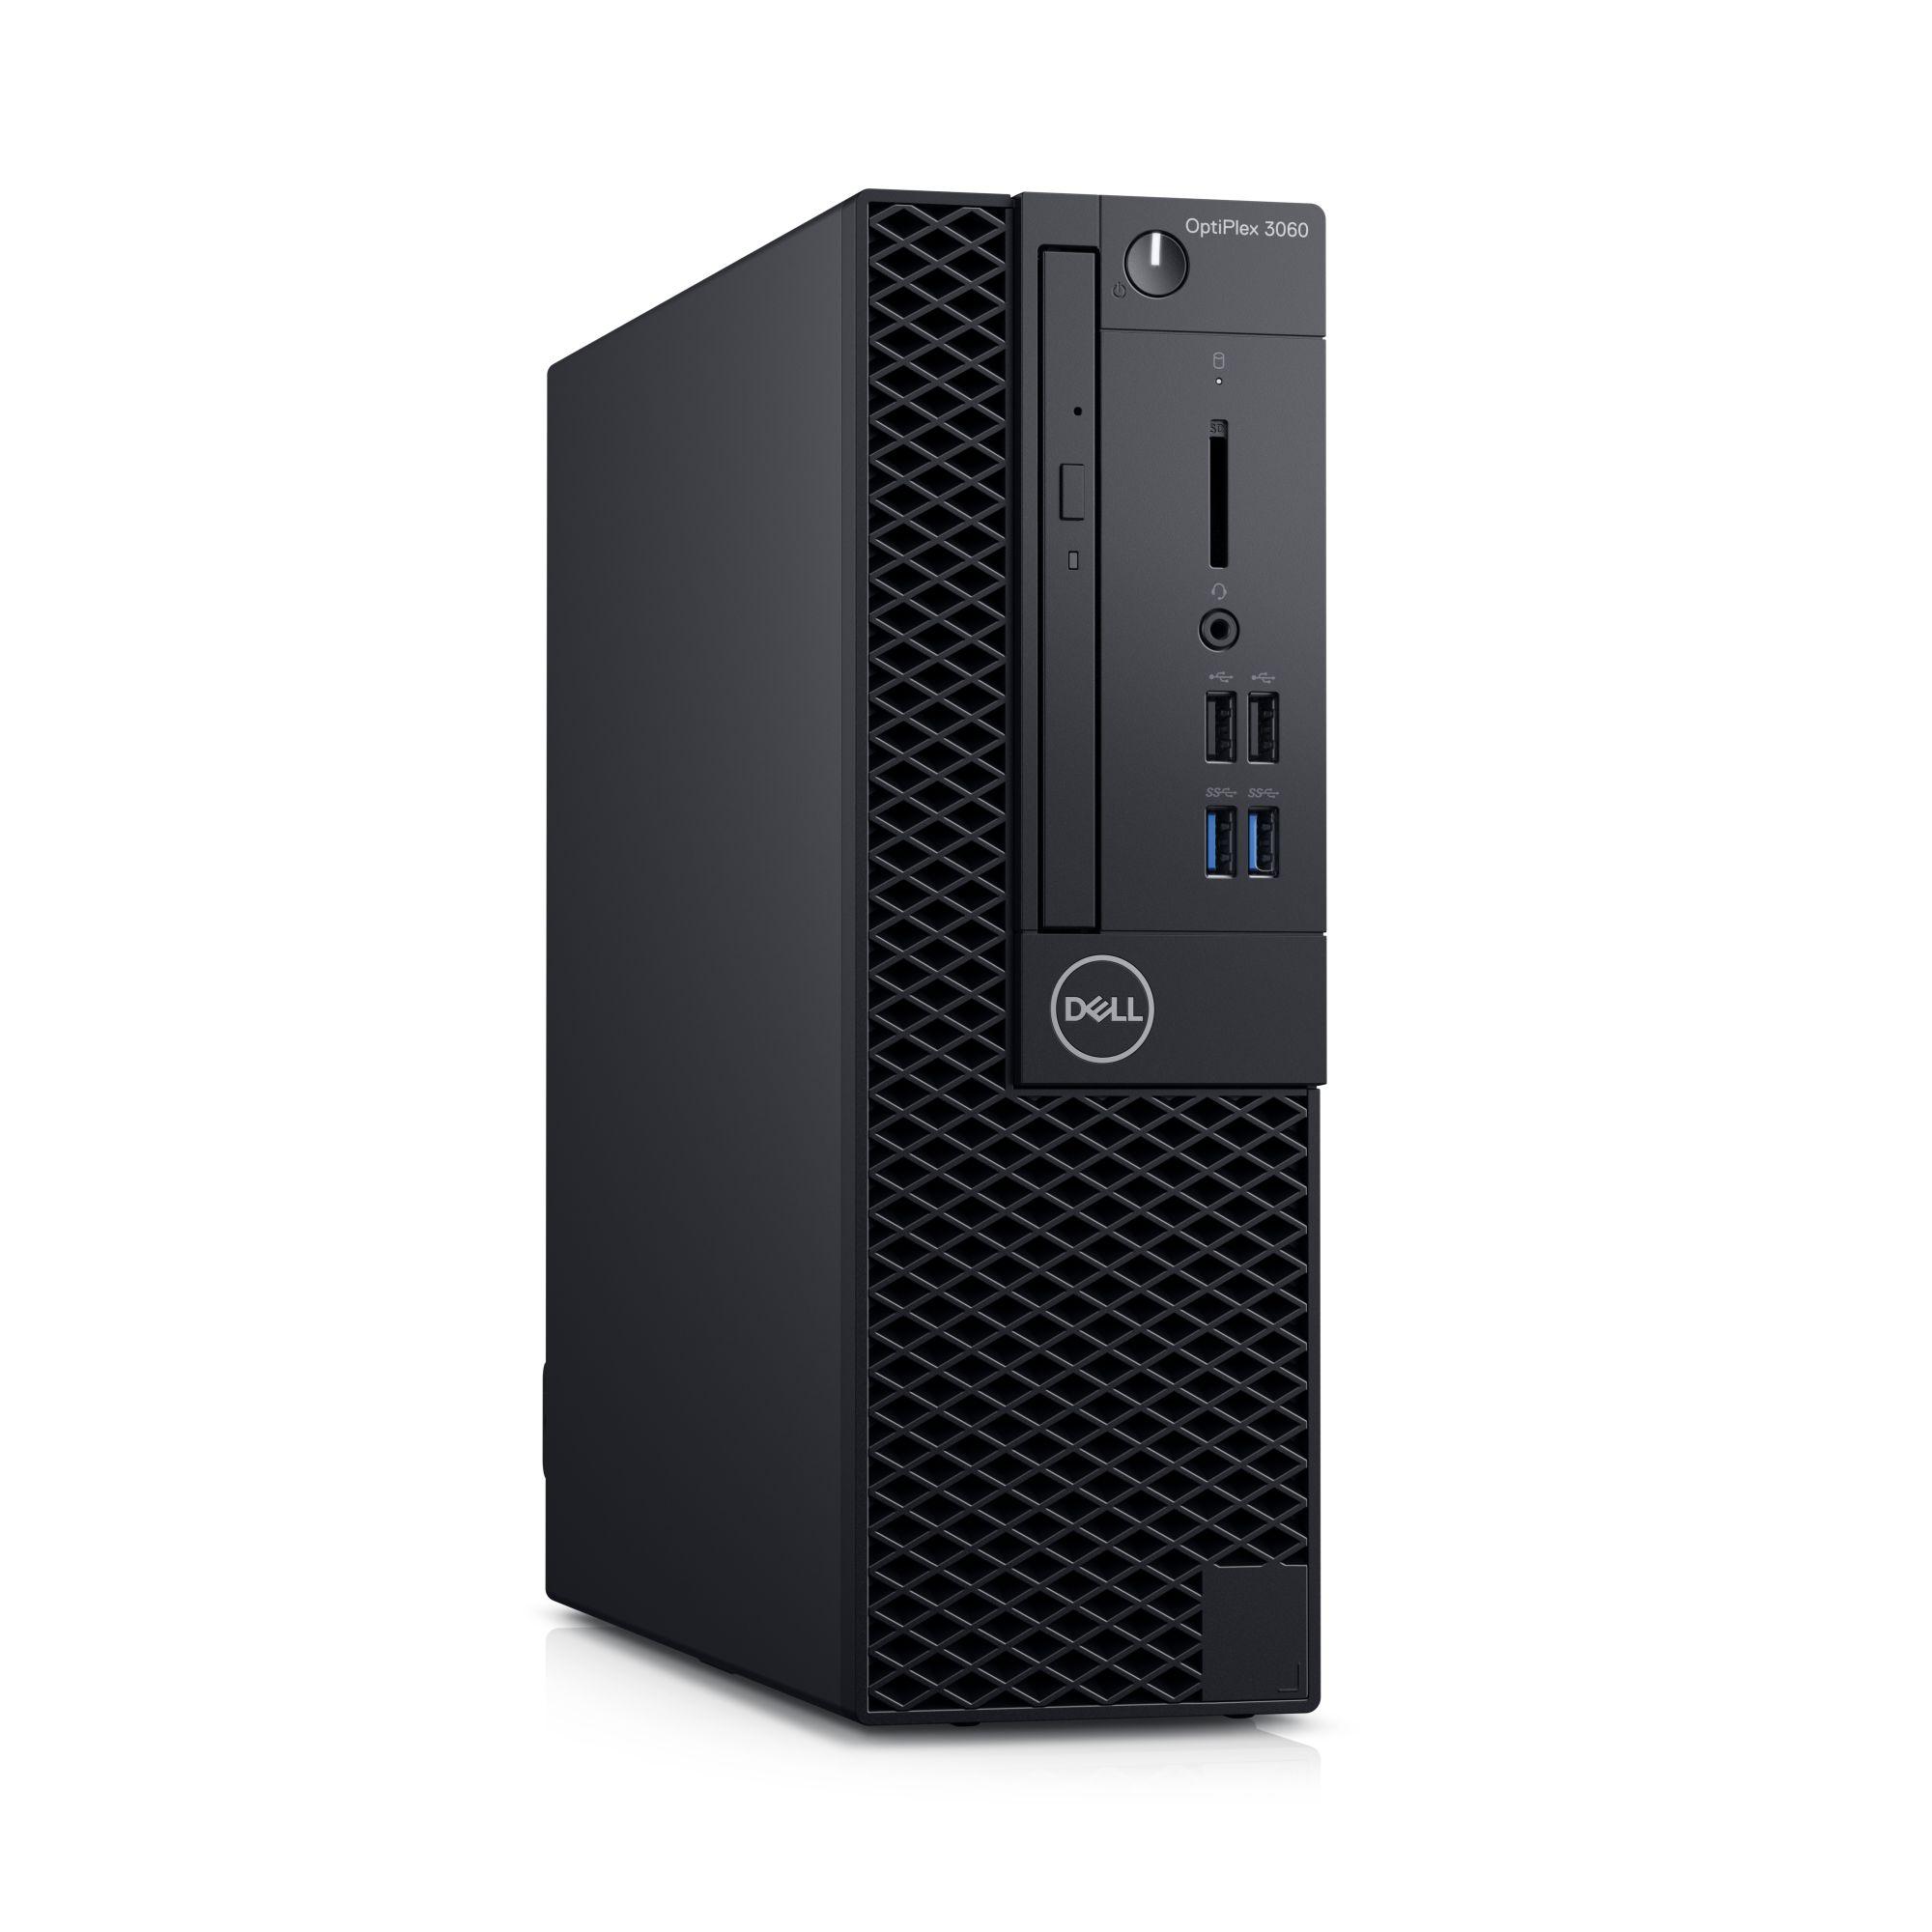 Dell PC Optiplex 3060 SF i5-8500/8GB/500GB/HDMI/DP/DVD/W10P/3RNBD